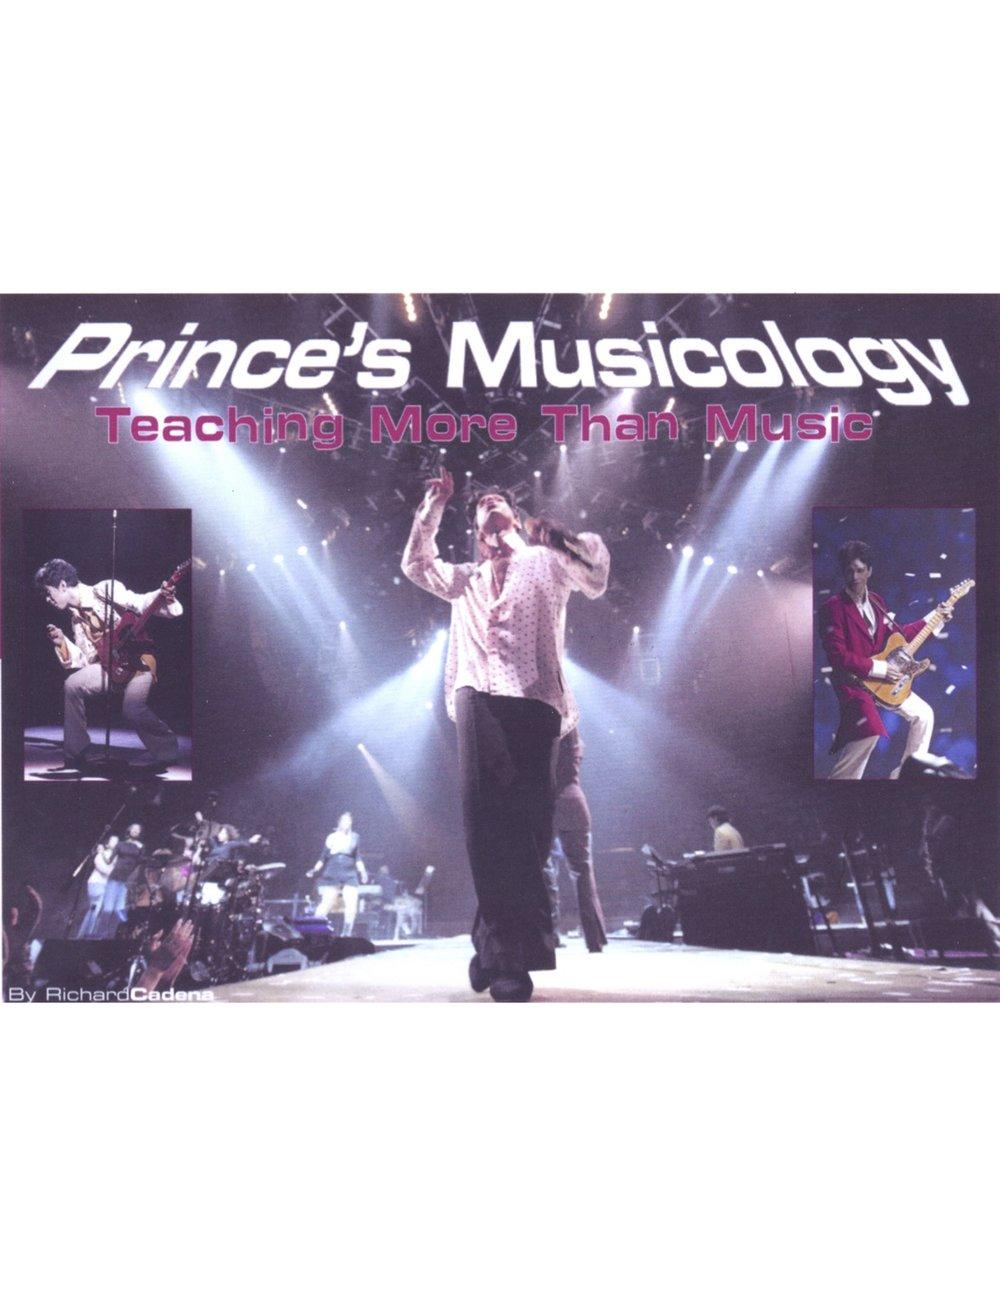 PRINCE MUSICOLOGY.jpg